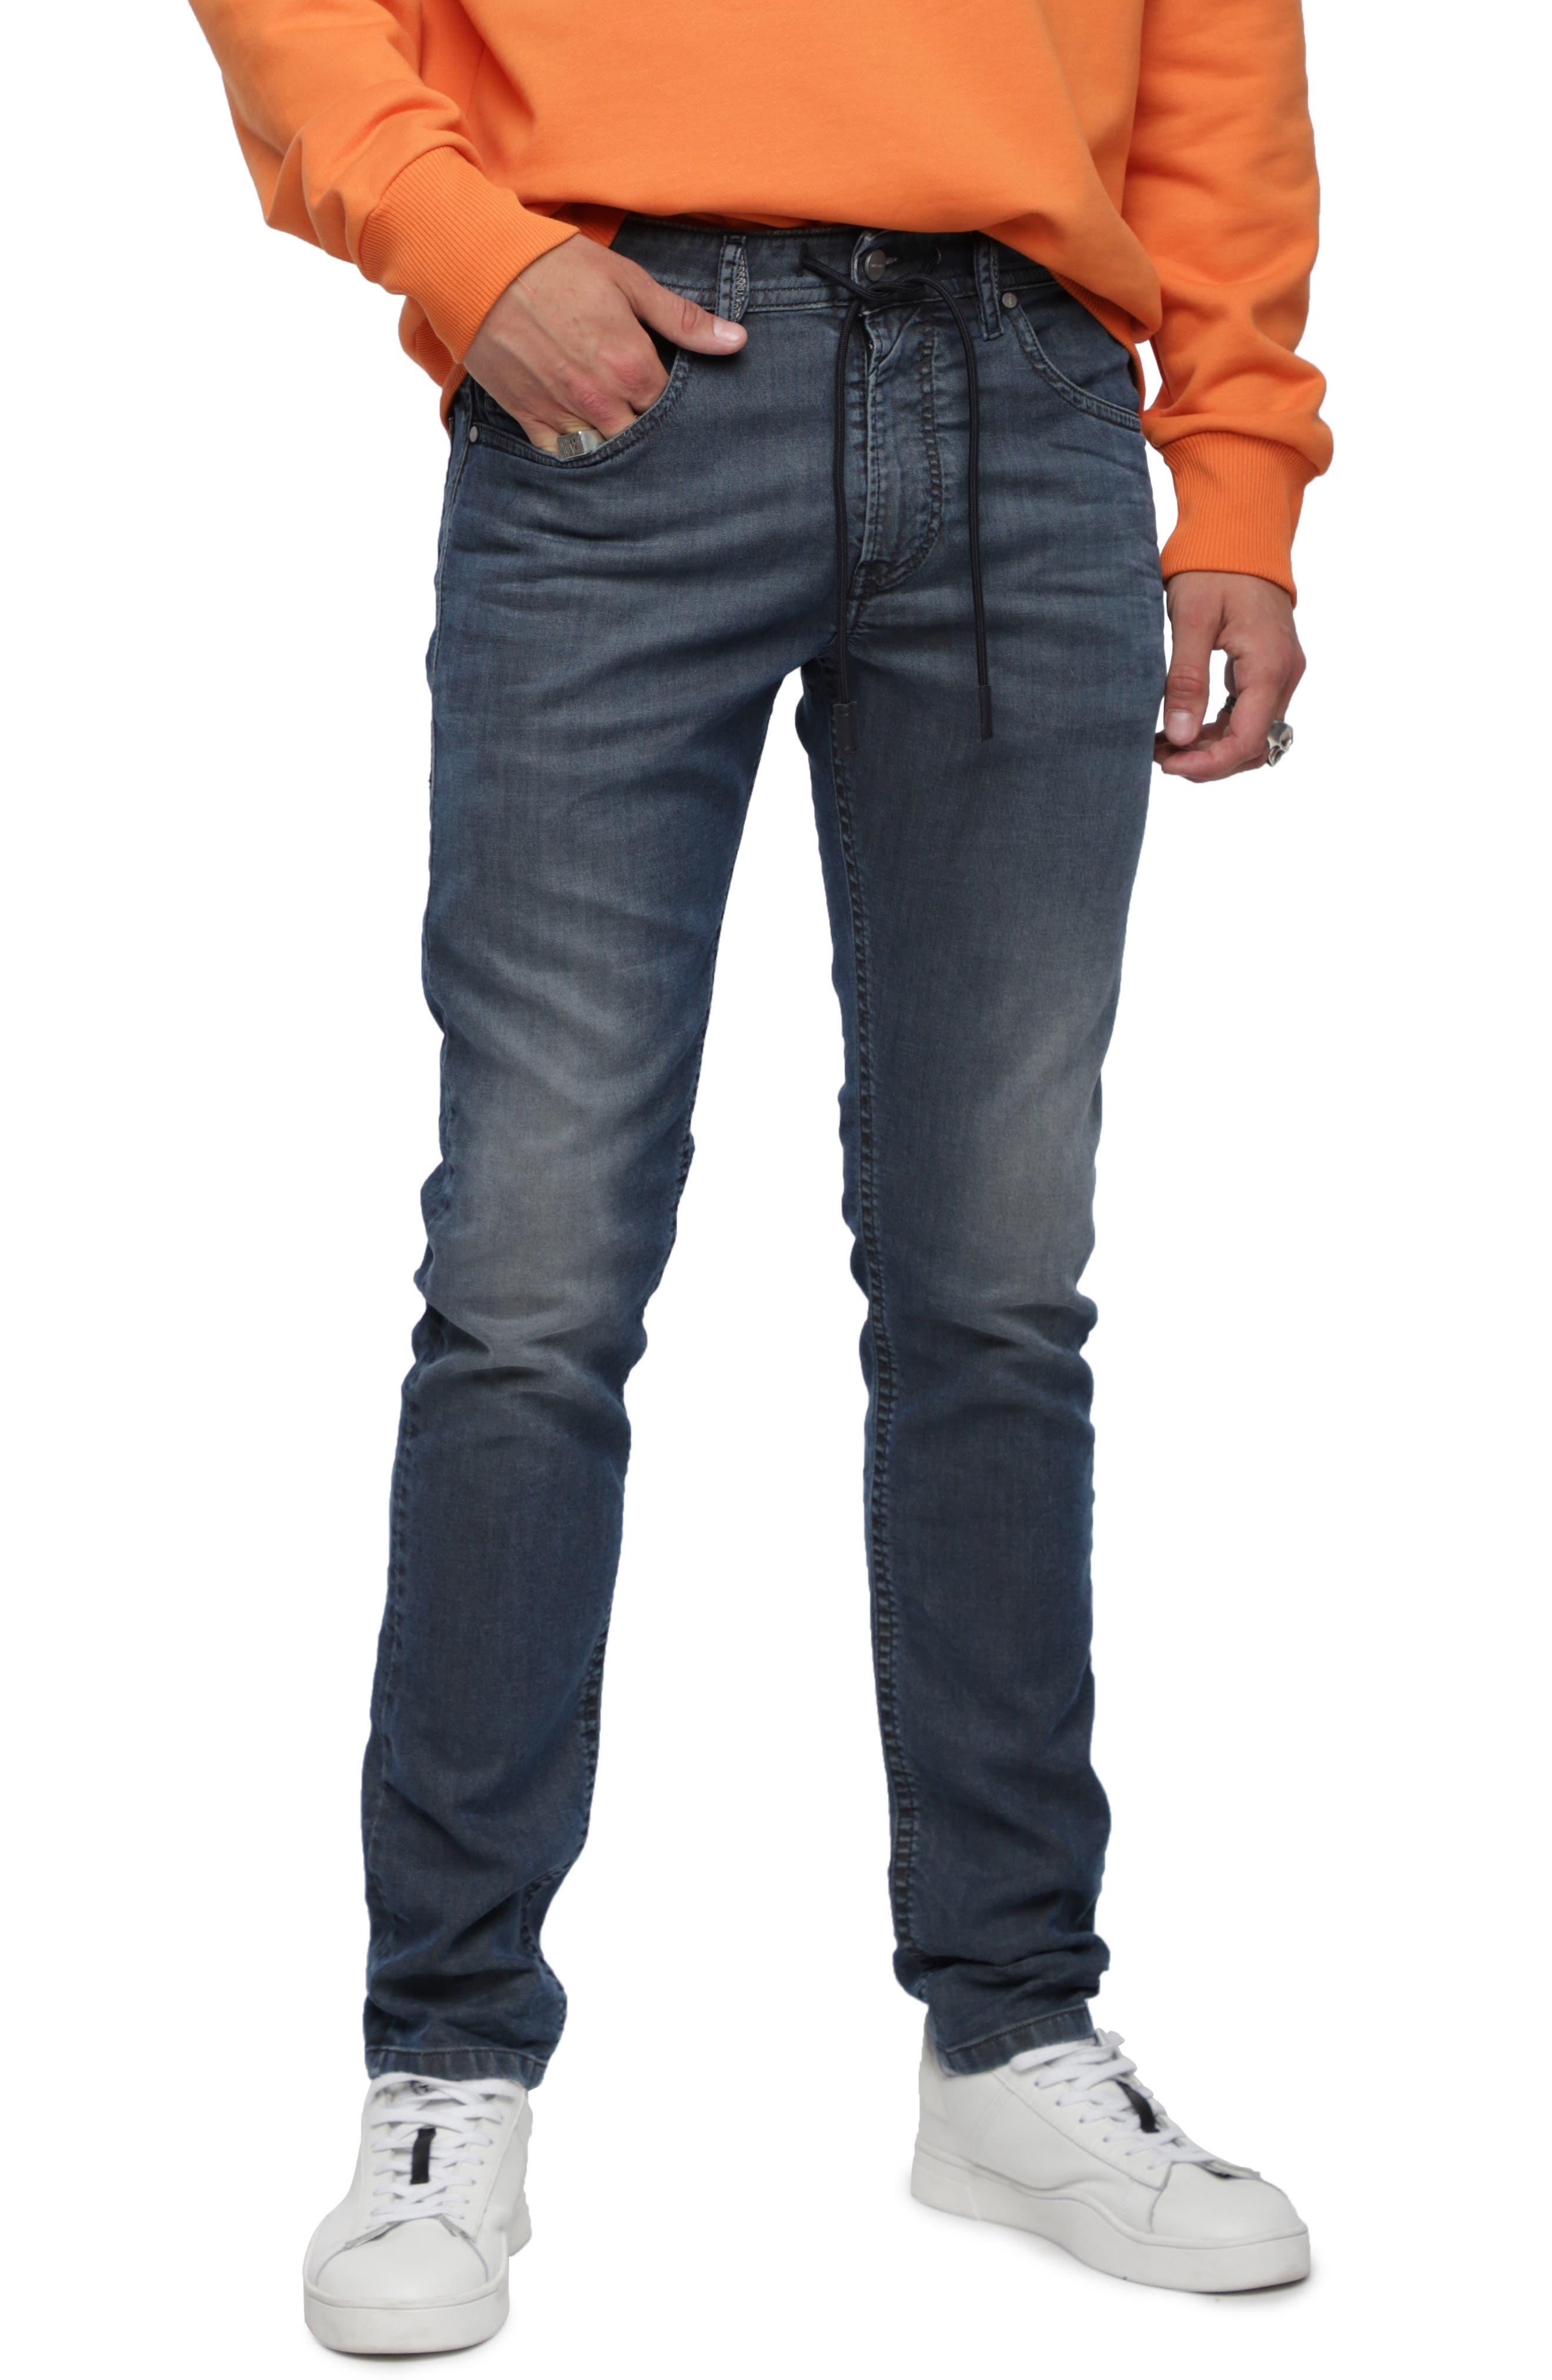 Thommer Slim Fit Jeans,                         Main,                         color, 084ZJ